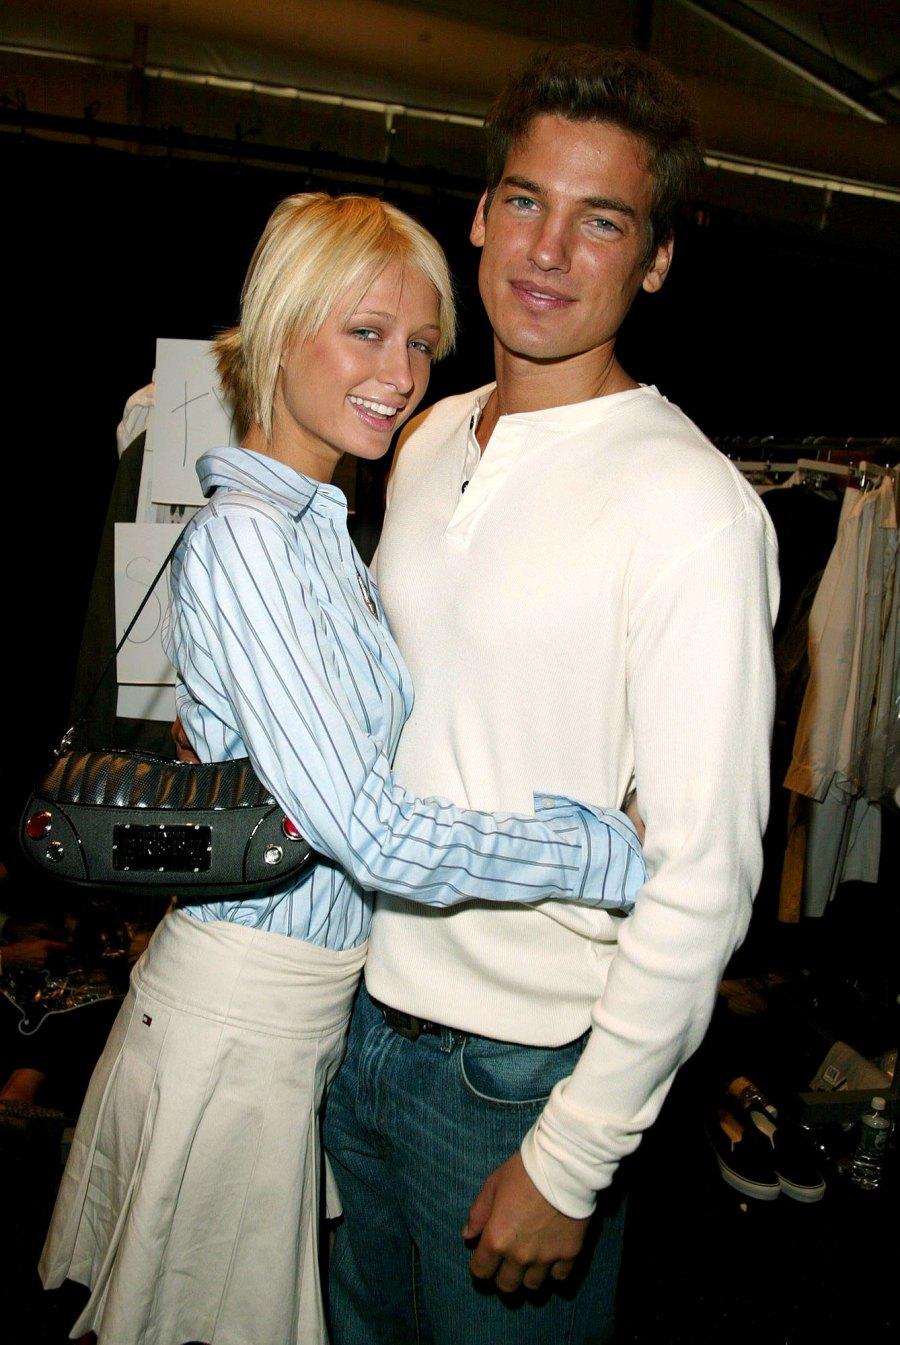 Jason Shaw Paris Hilton Complete Dating History